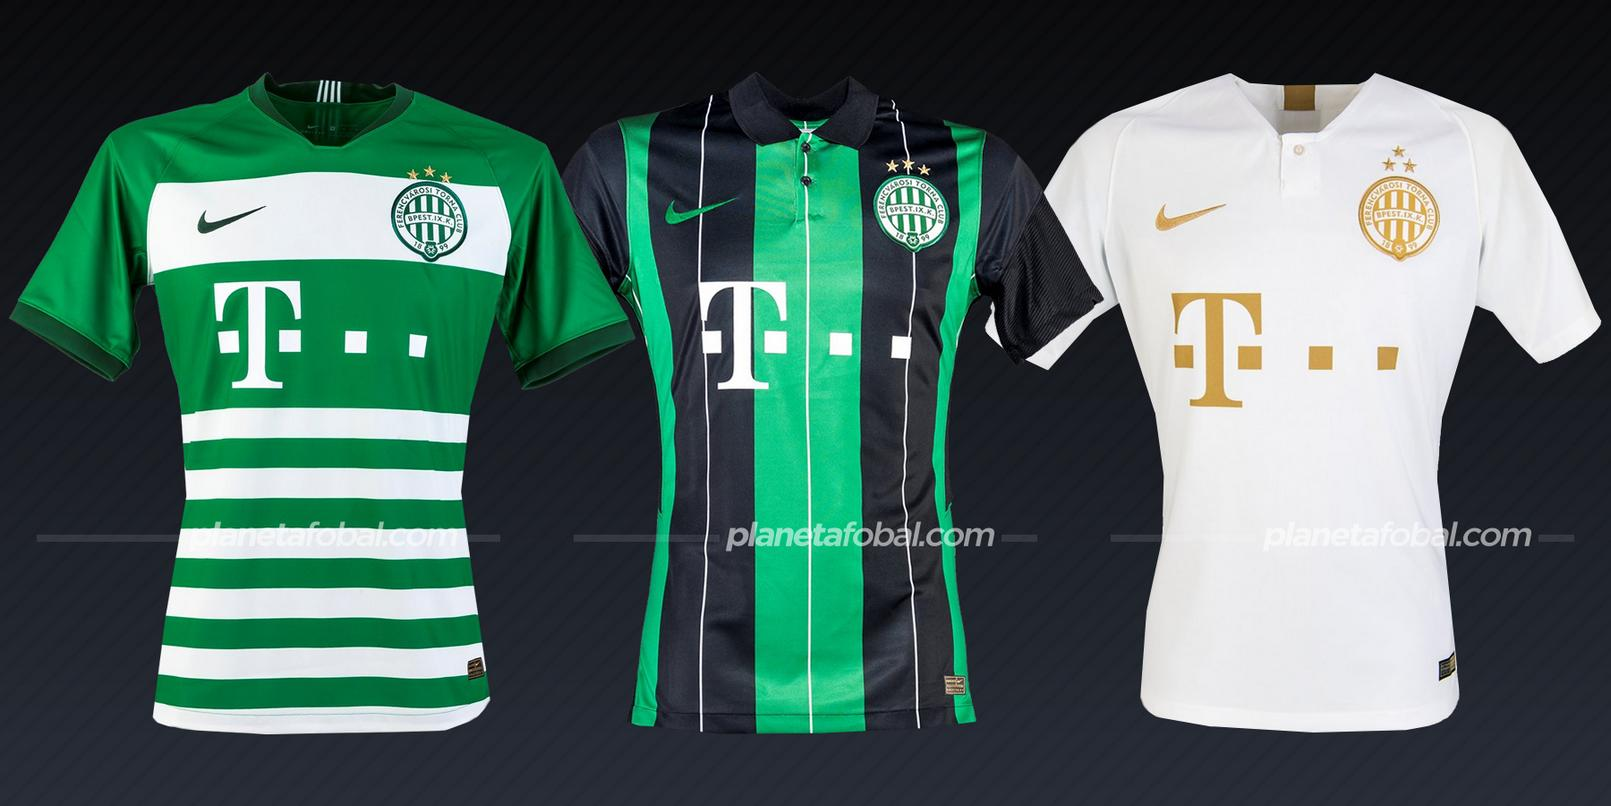 Ferencvçaros (Nike) | Camisetas de la Champions League 2020/2021